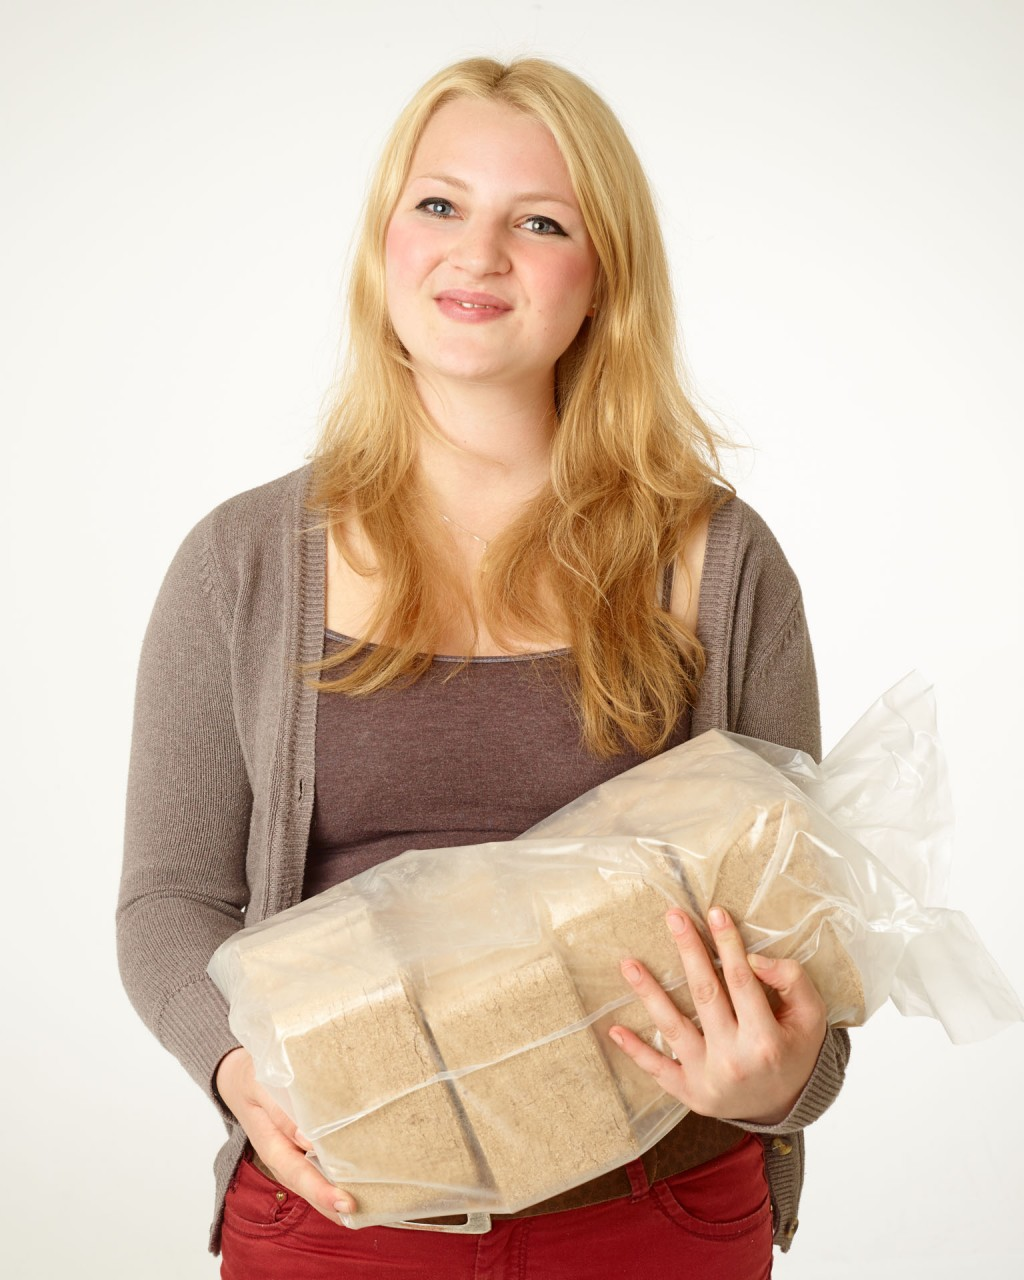 Holzbriketts Vulcano RUF Premium Qualität aus Hartholz 10 kg Testpaket